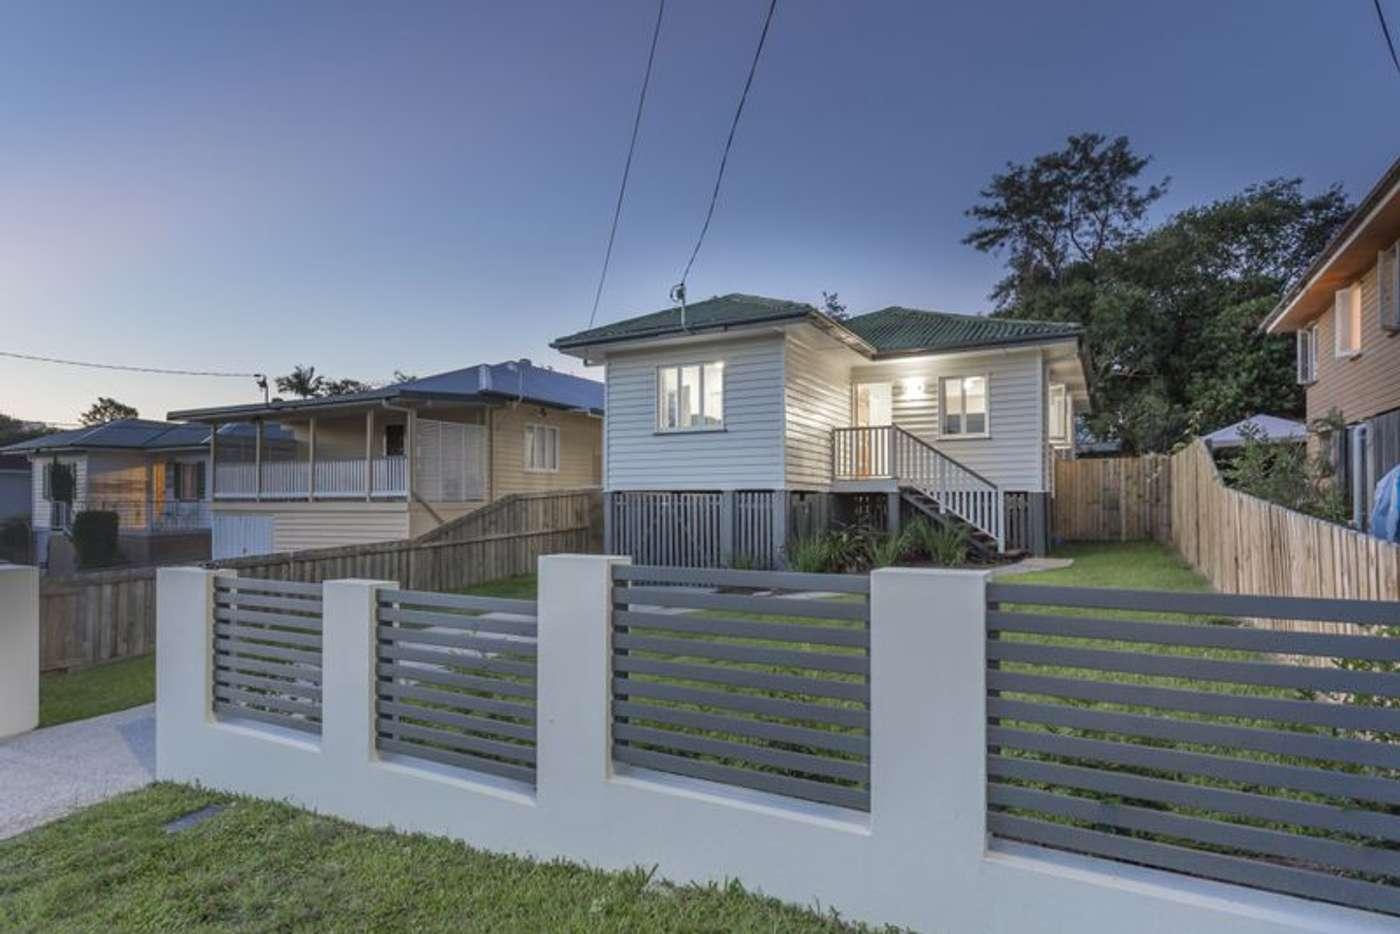 Main view of Homely house listing, 100 Lindwall Street, Upper Mount Gravatt QLD 4122